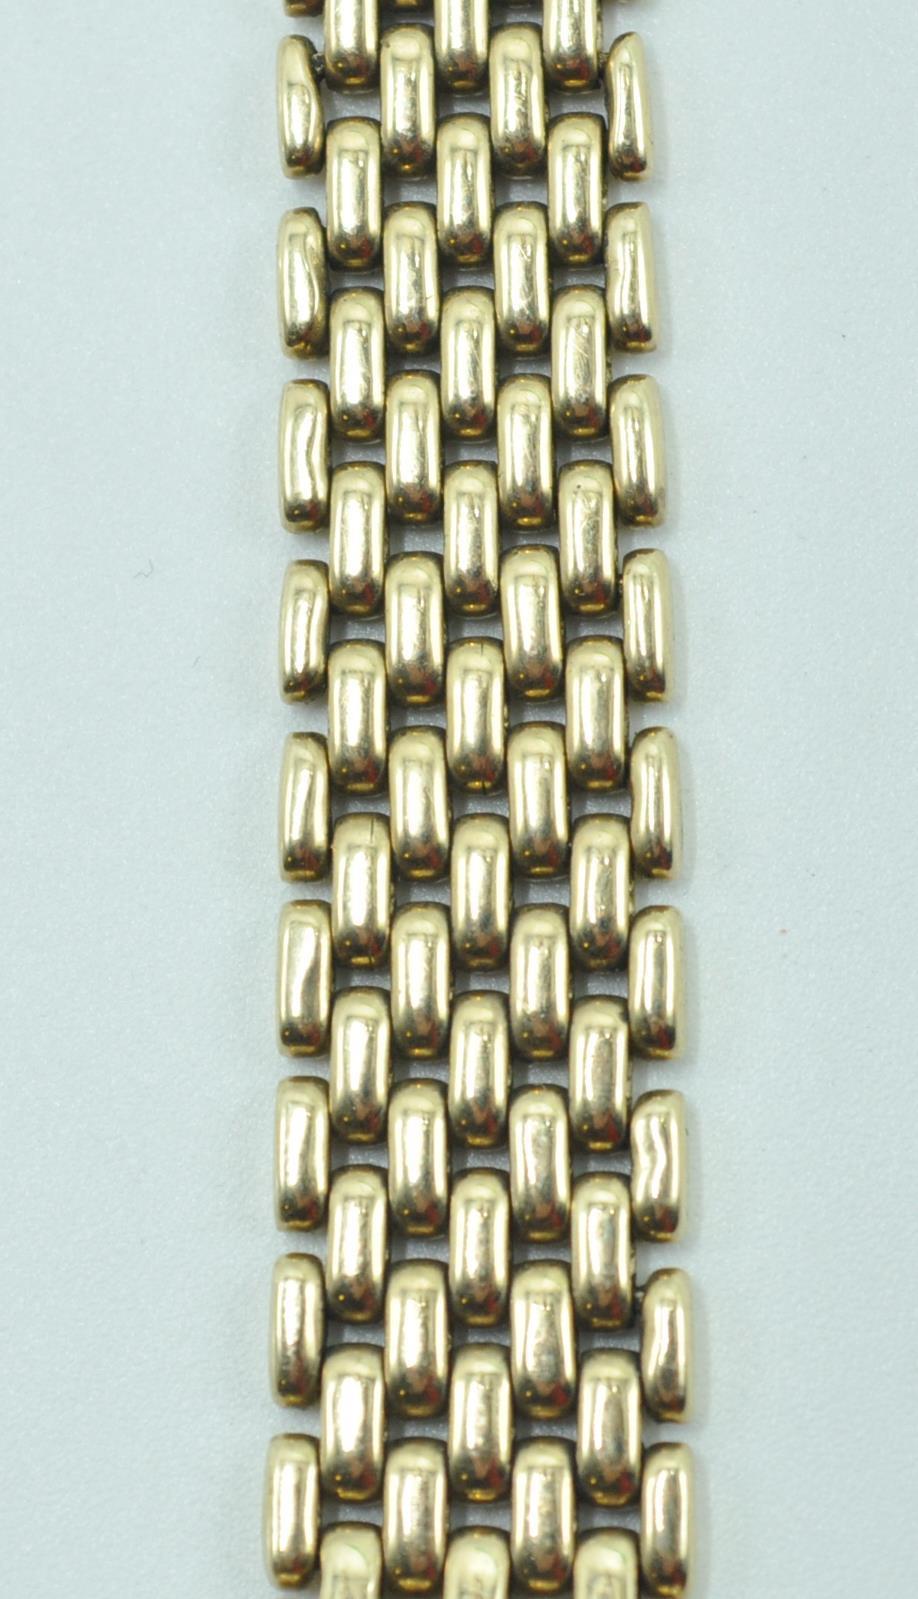 BUECHE GIROD 9CT GOLD AND DIAMOND WRIST WATCH - Image 4 of 8